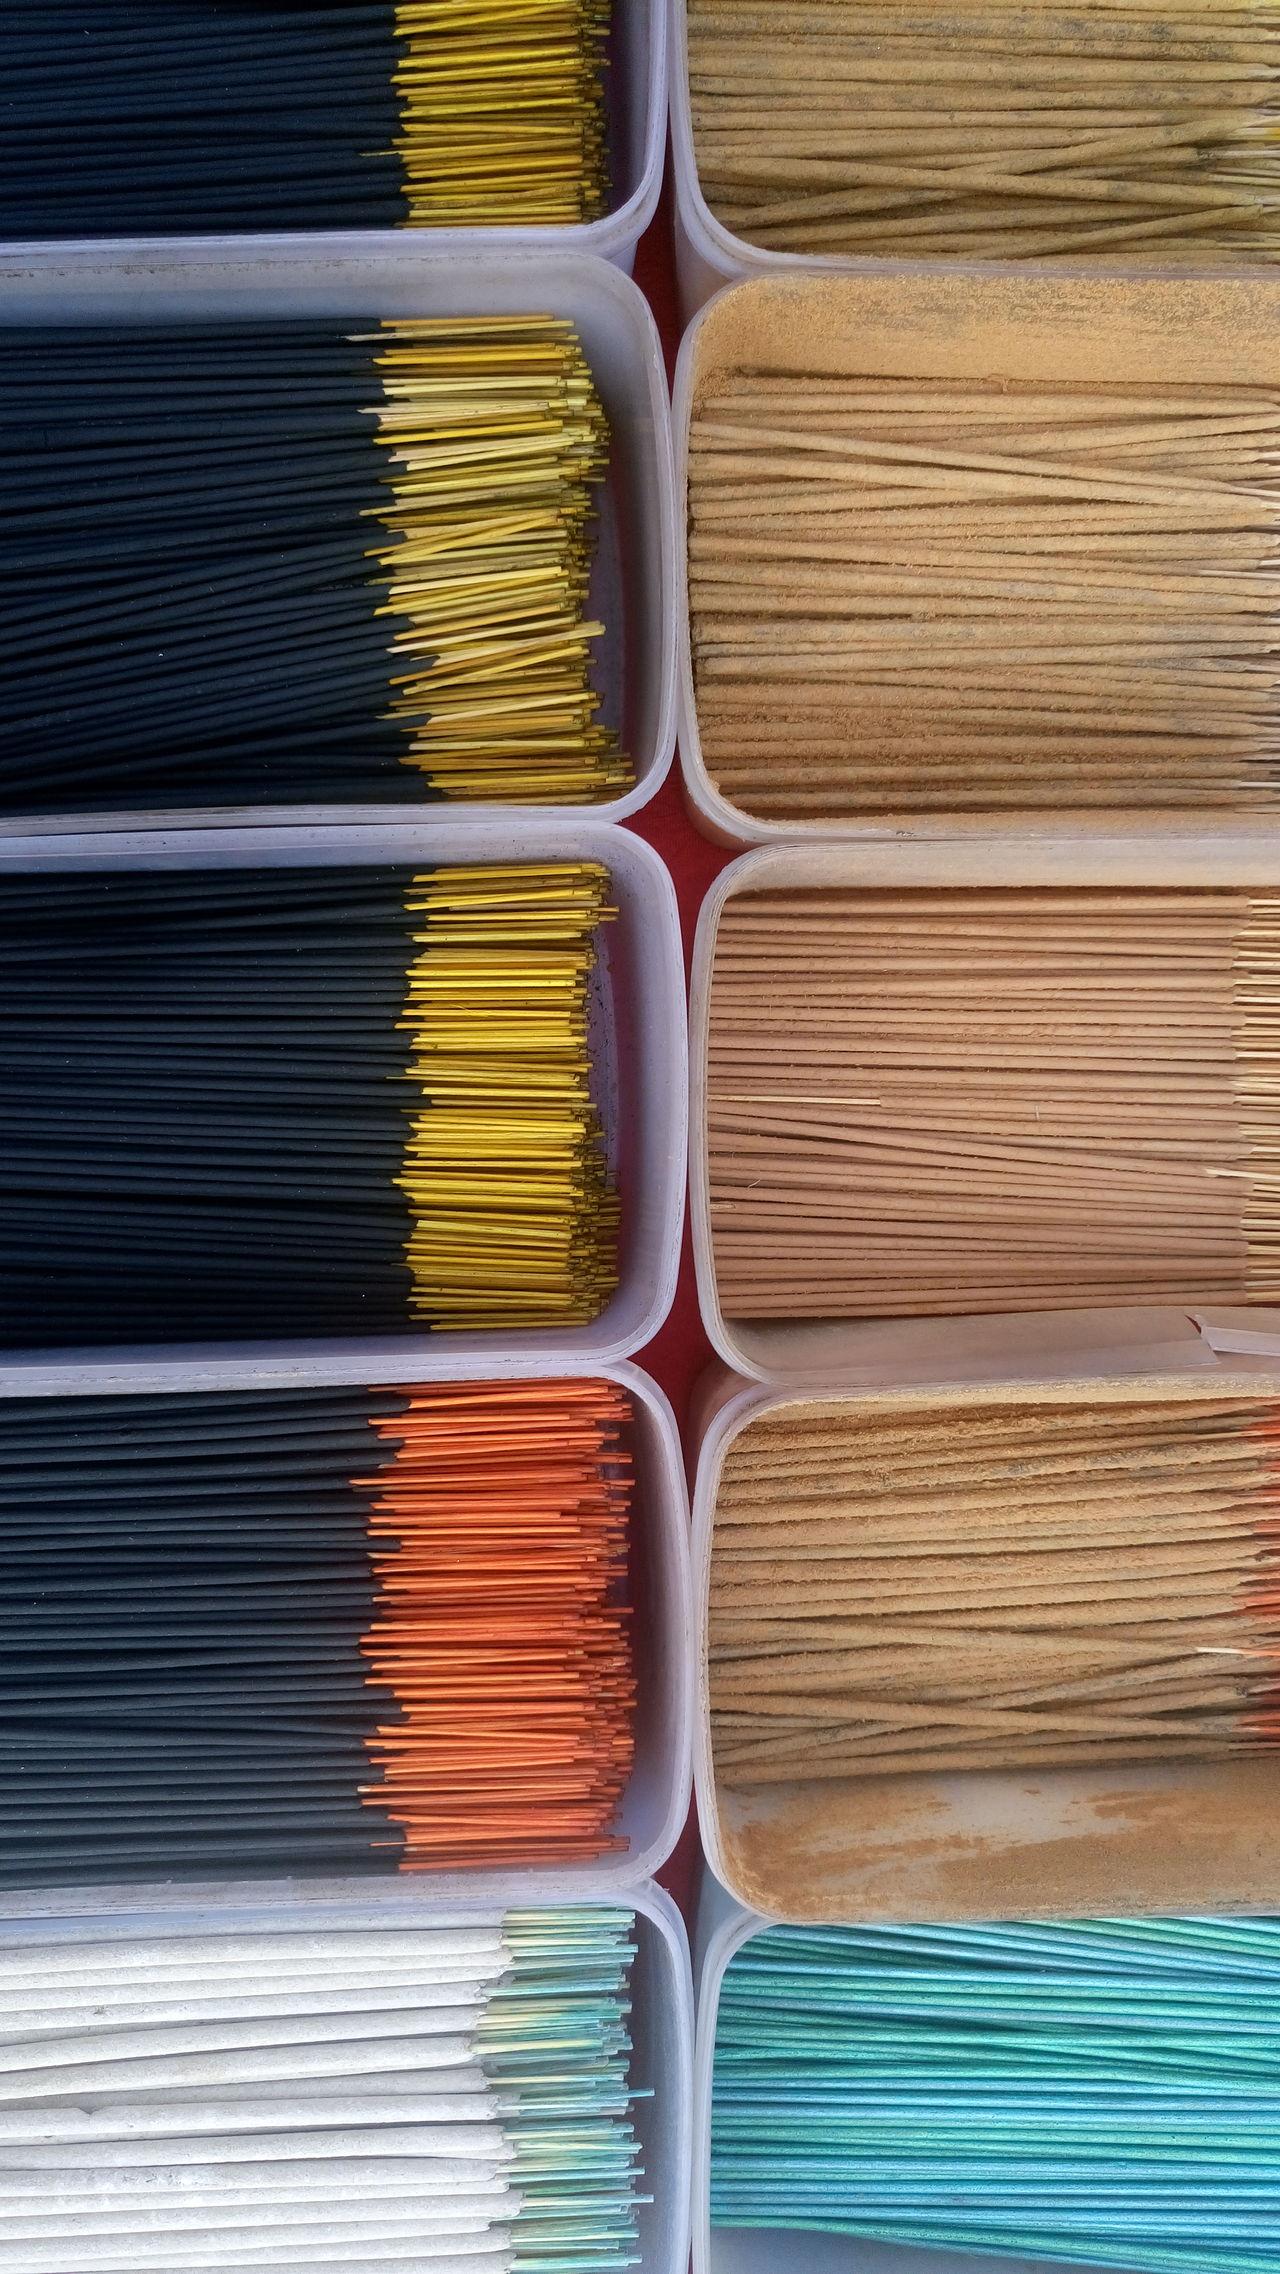 Beautiful stock photos of muster, Abundance, Arrangement, Backgrounds, Container